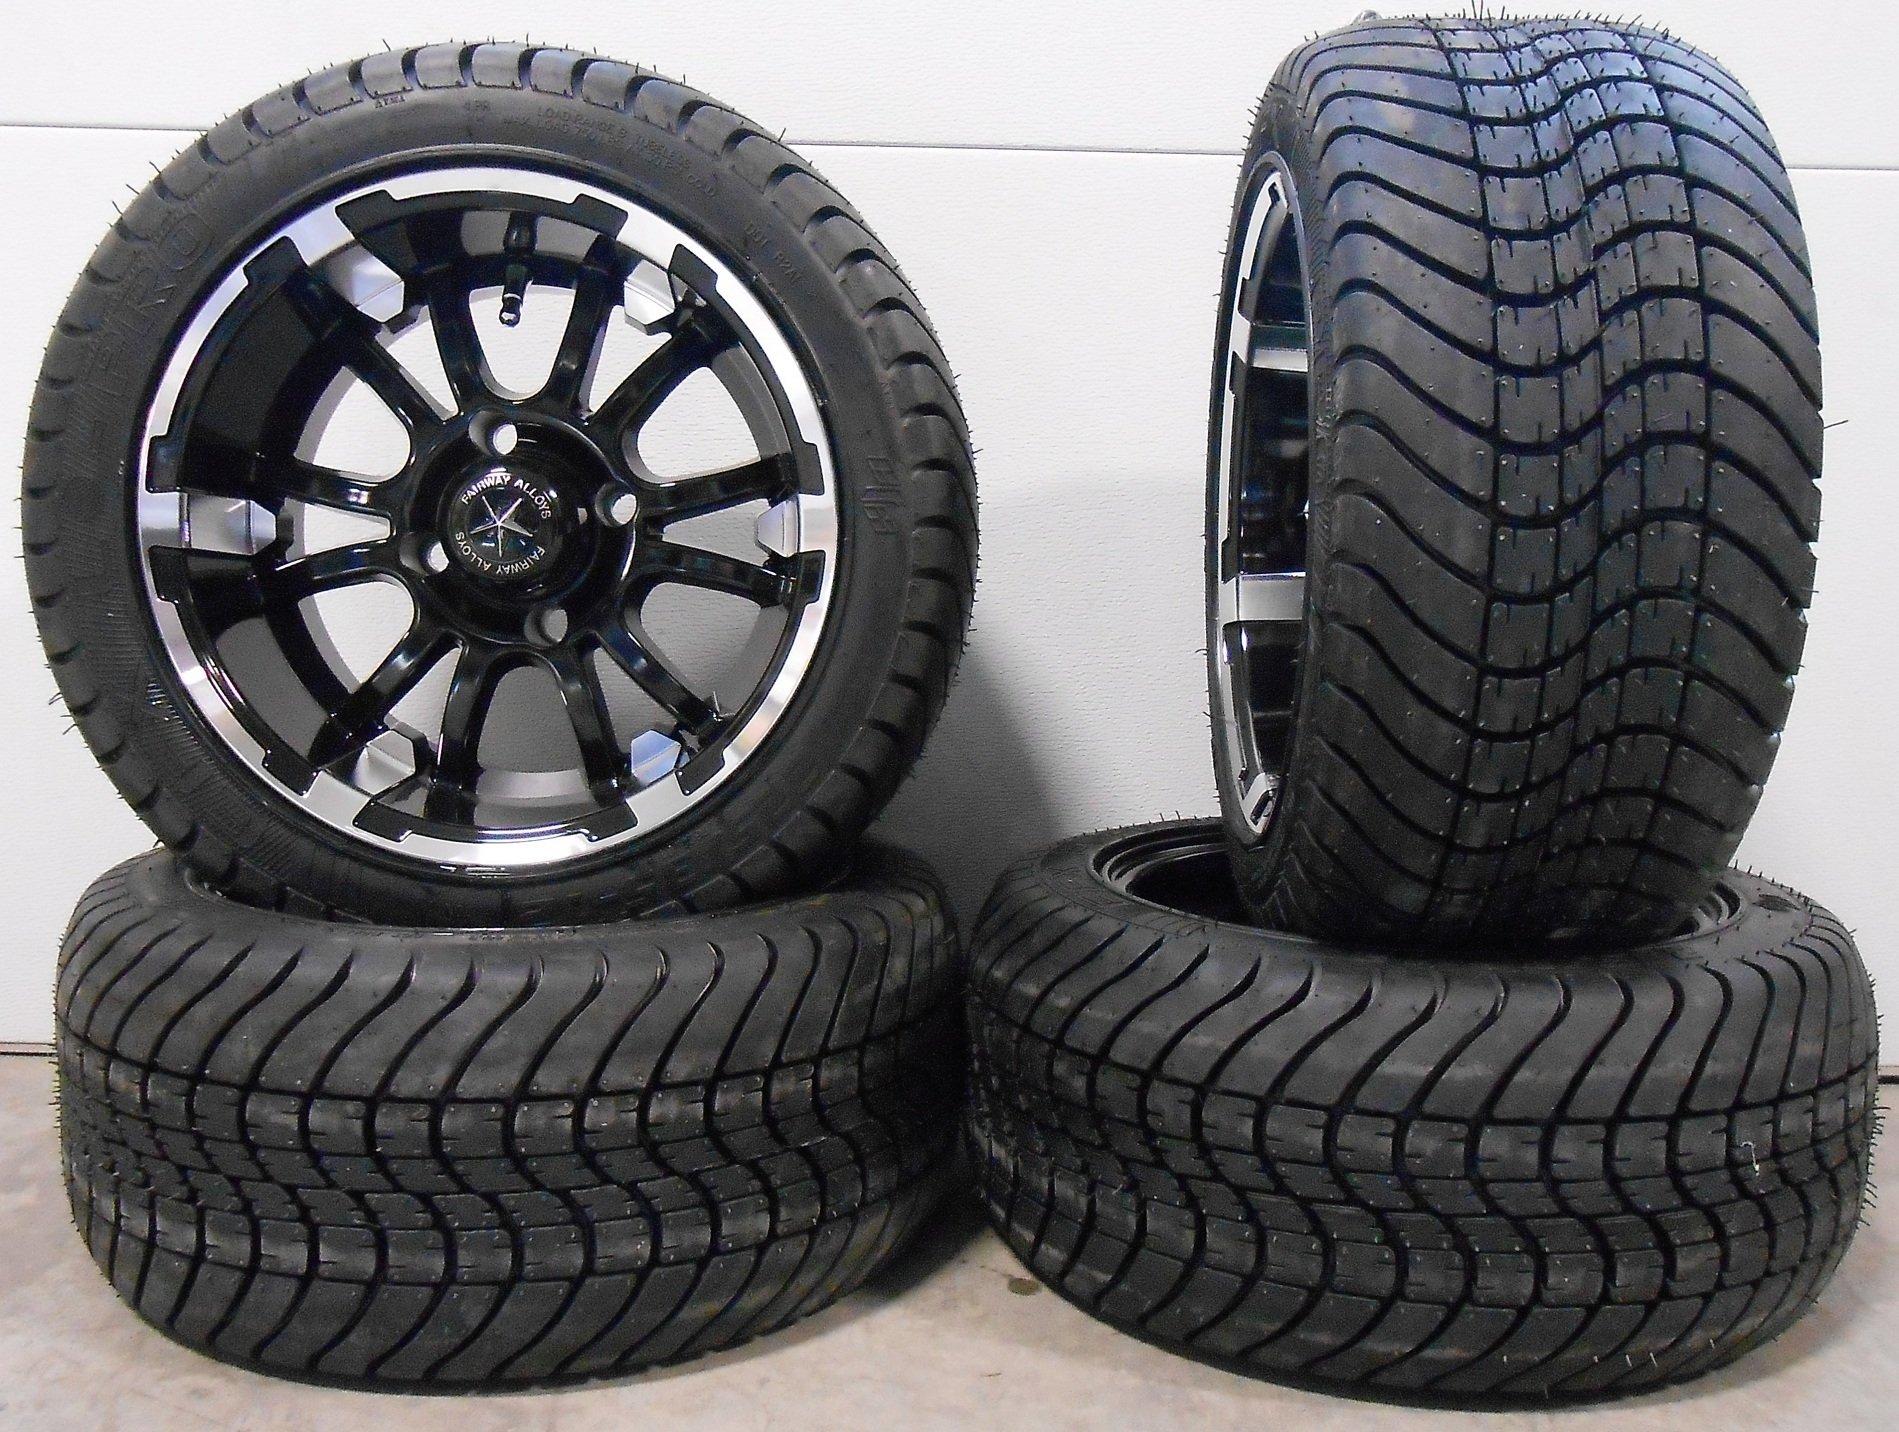 Bundle - 9 items: Fairway Alloys Sixer Golf Wheels 12'' EFX Lo Pro 225x35-12 Tires